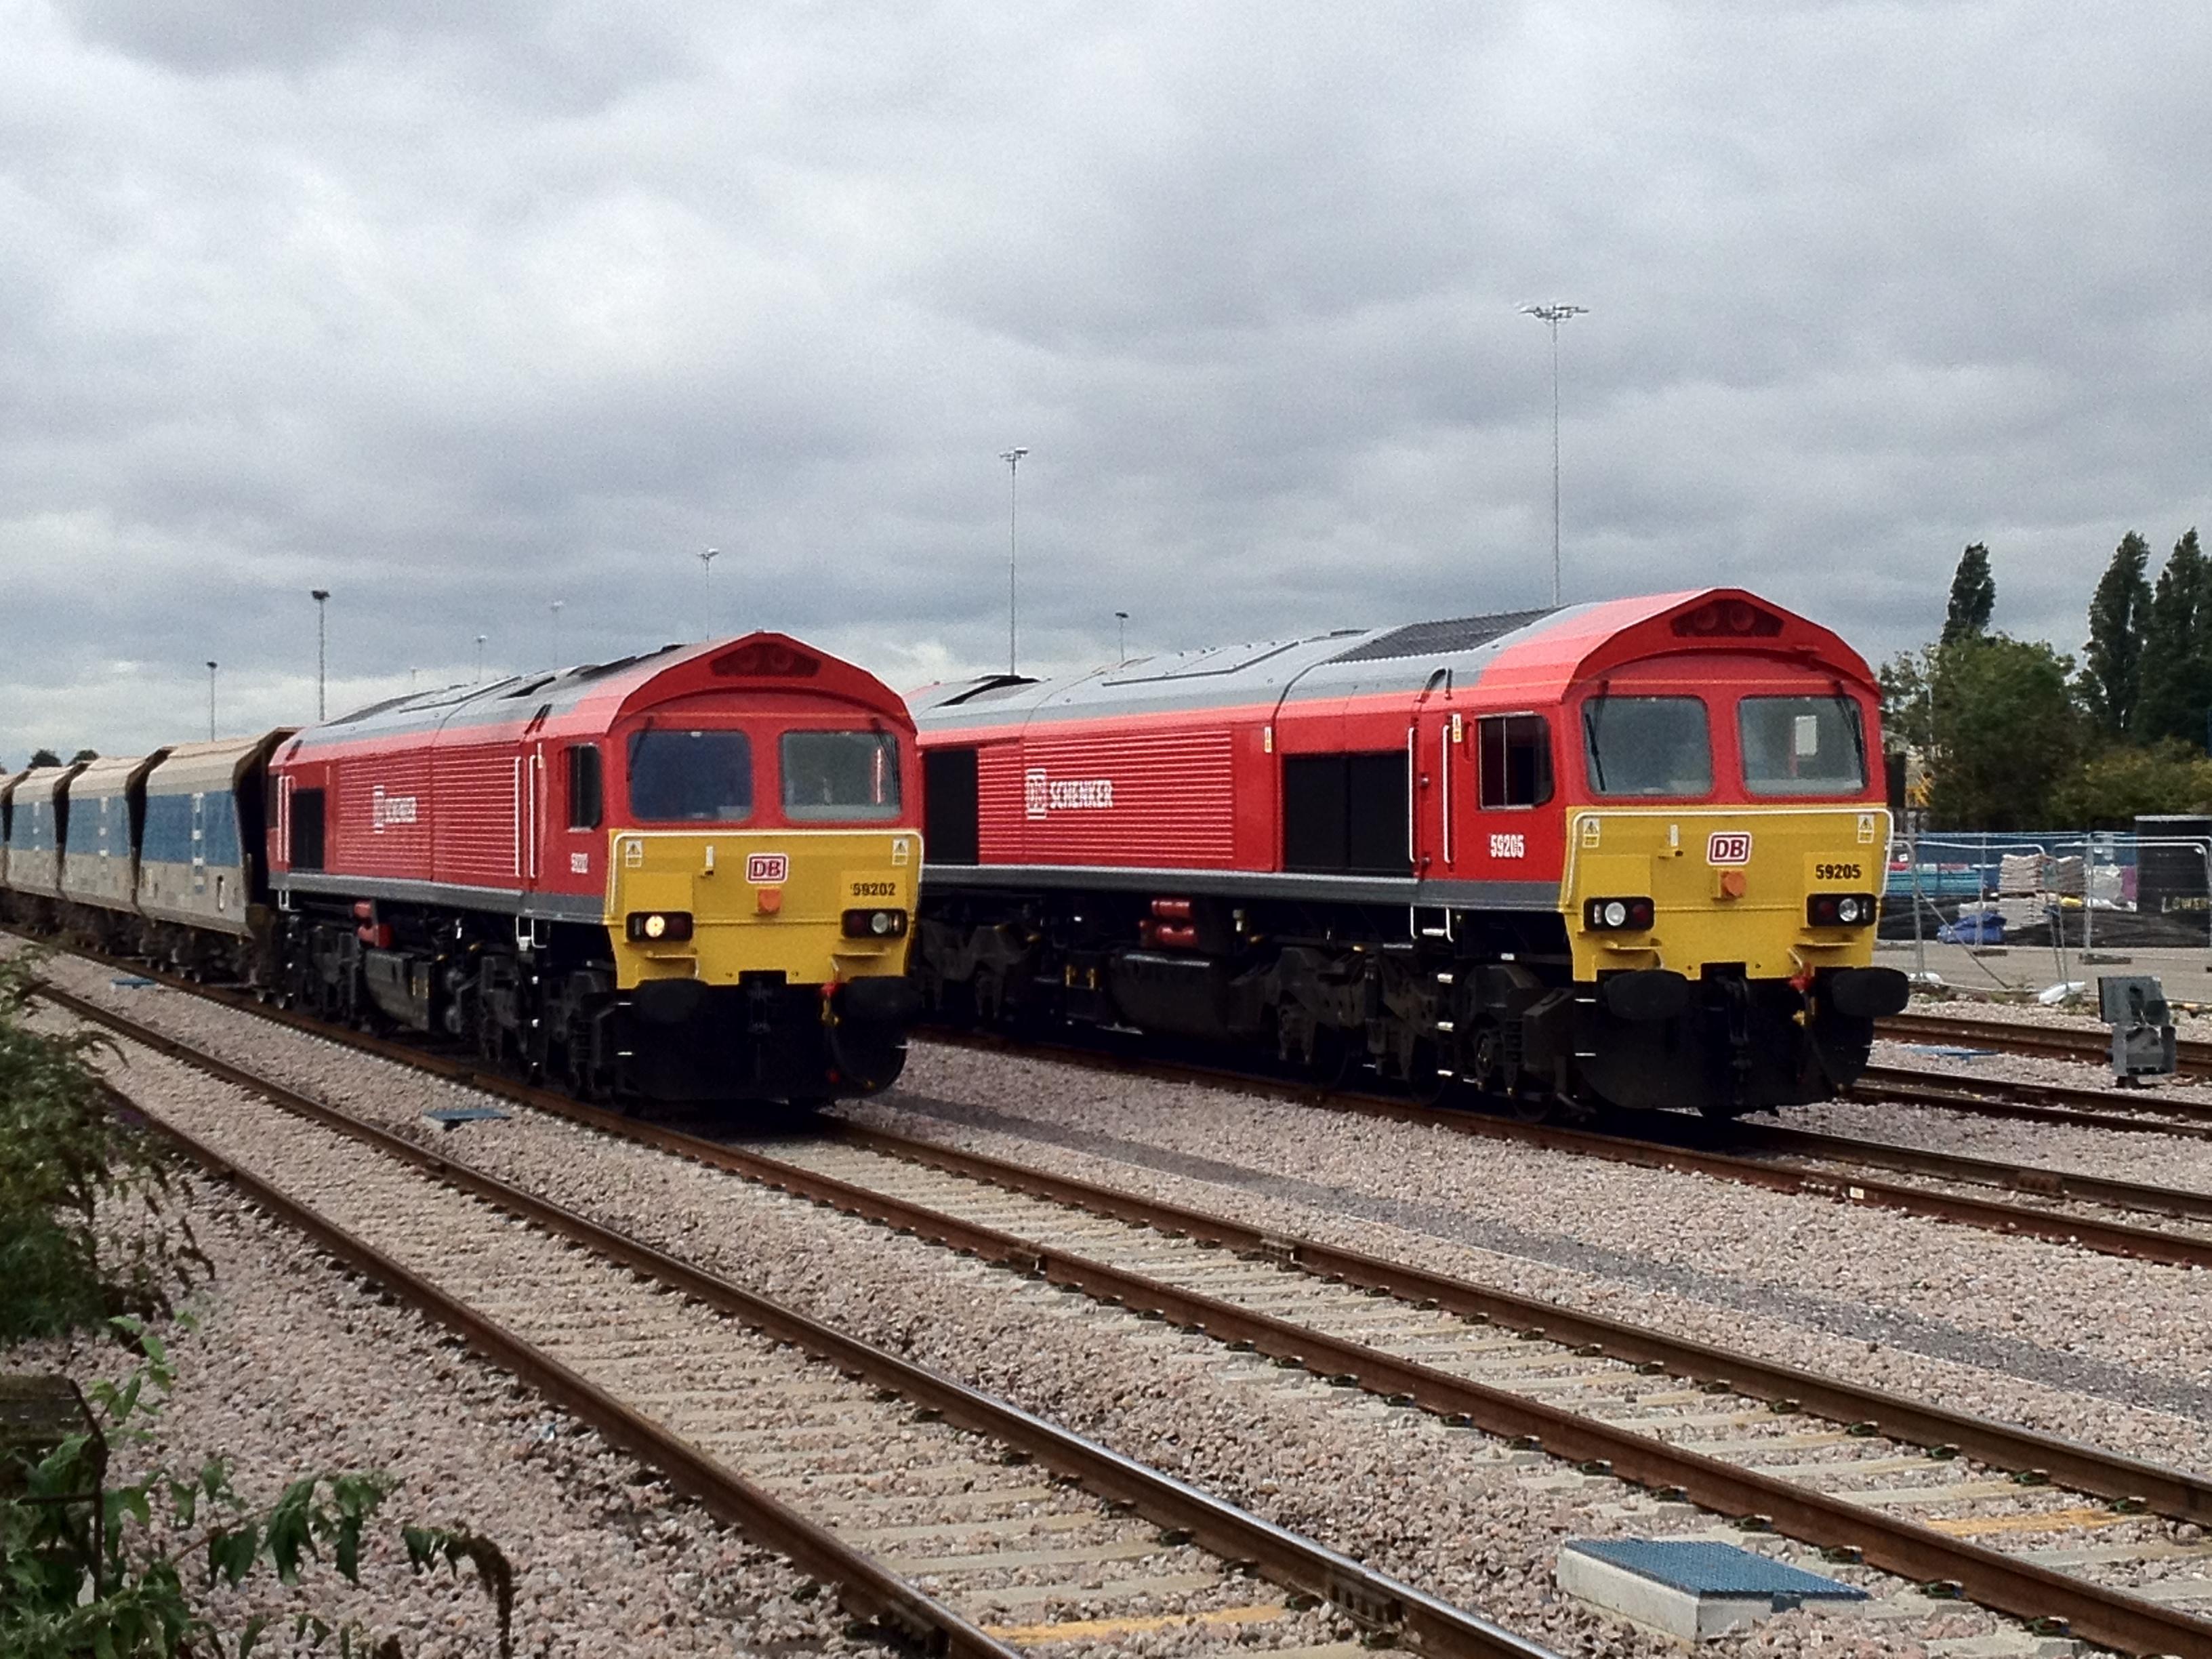 British Rail Class 59